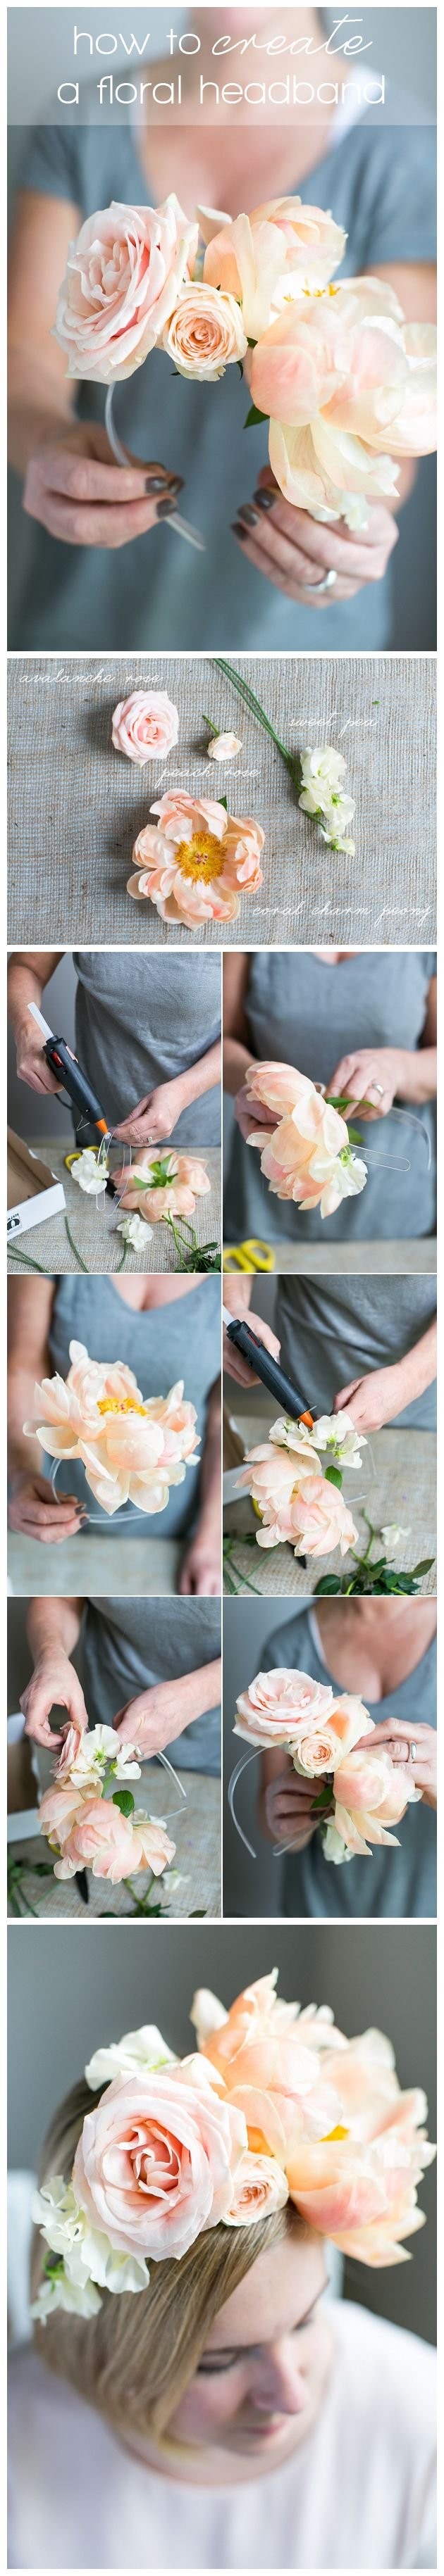 How To Make An Asymmetrical Floral #Headband